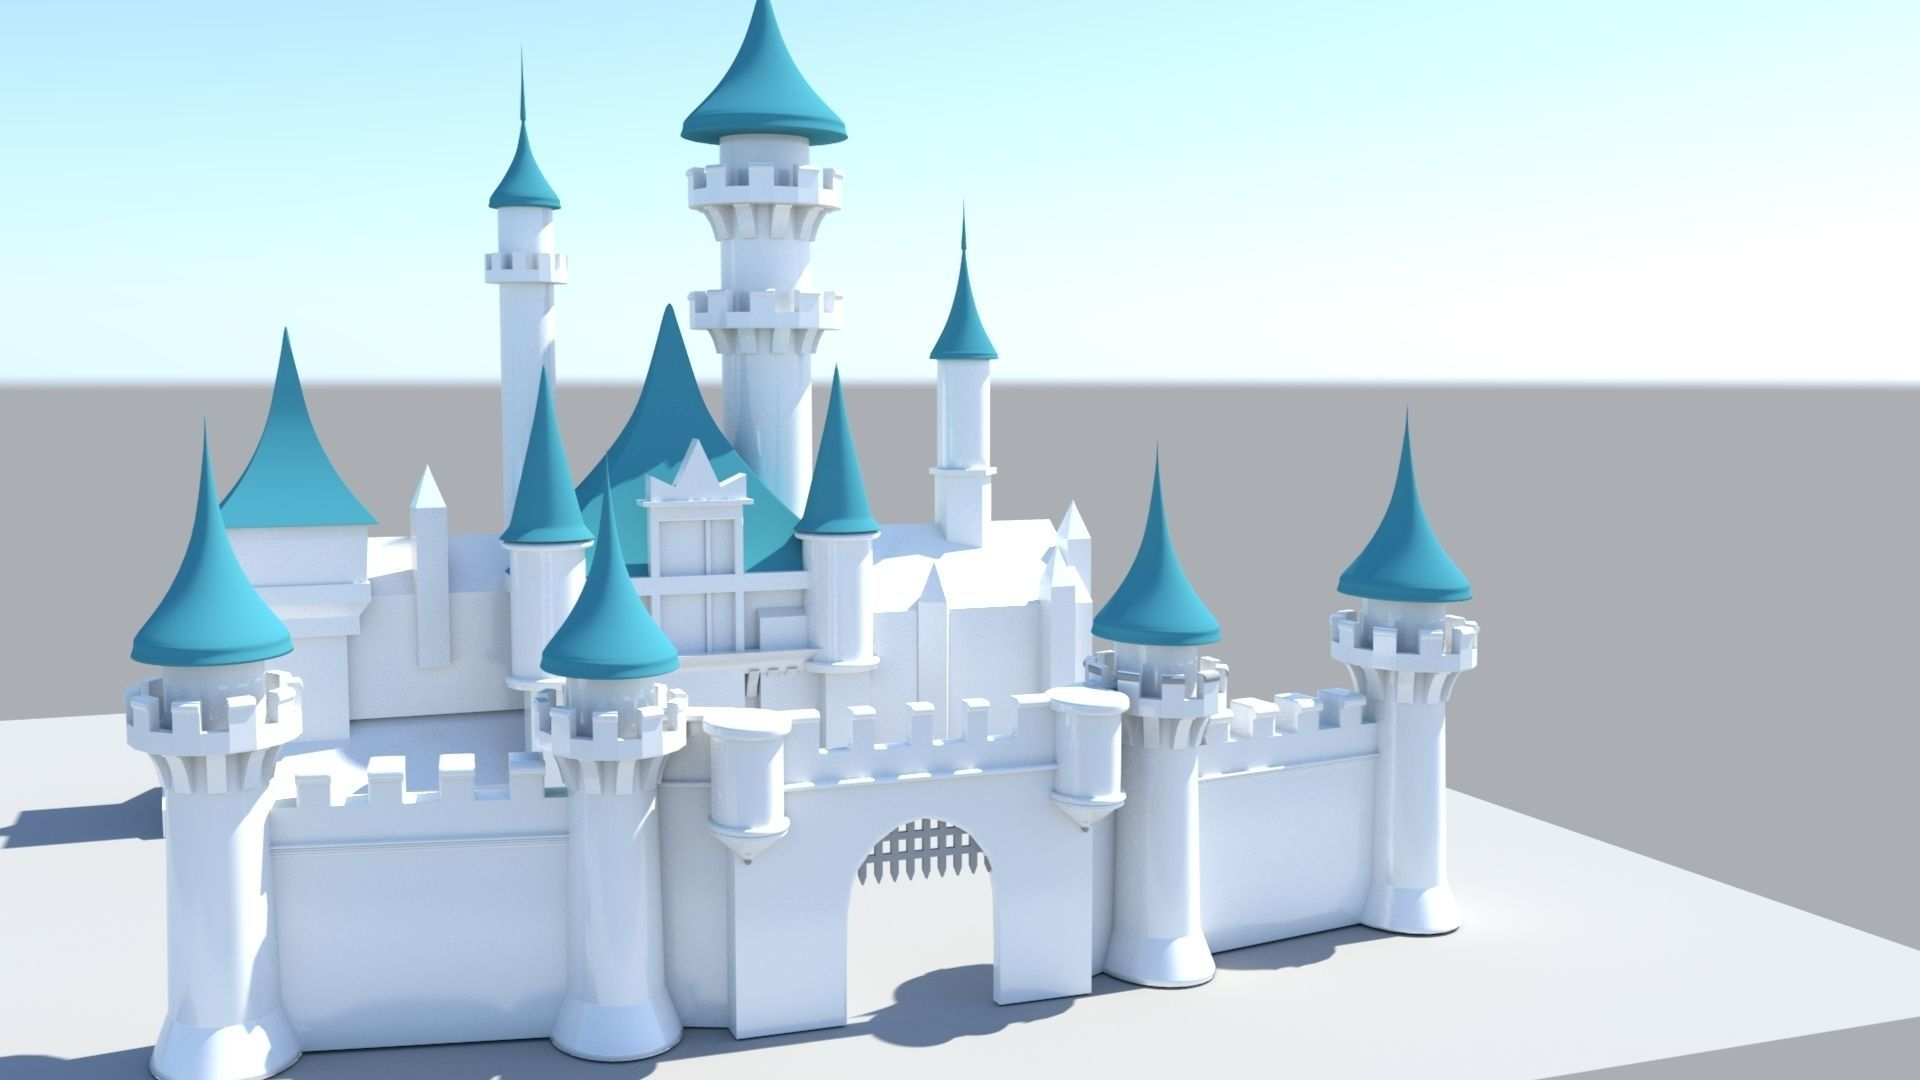 Disney Castle 3D model